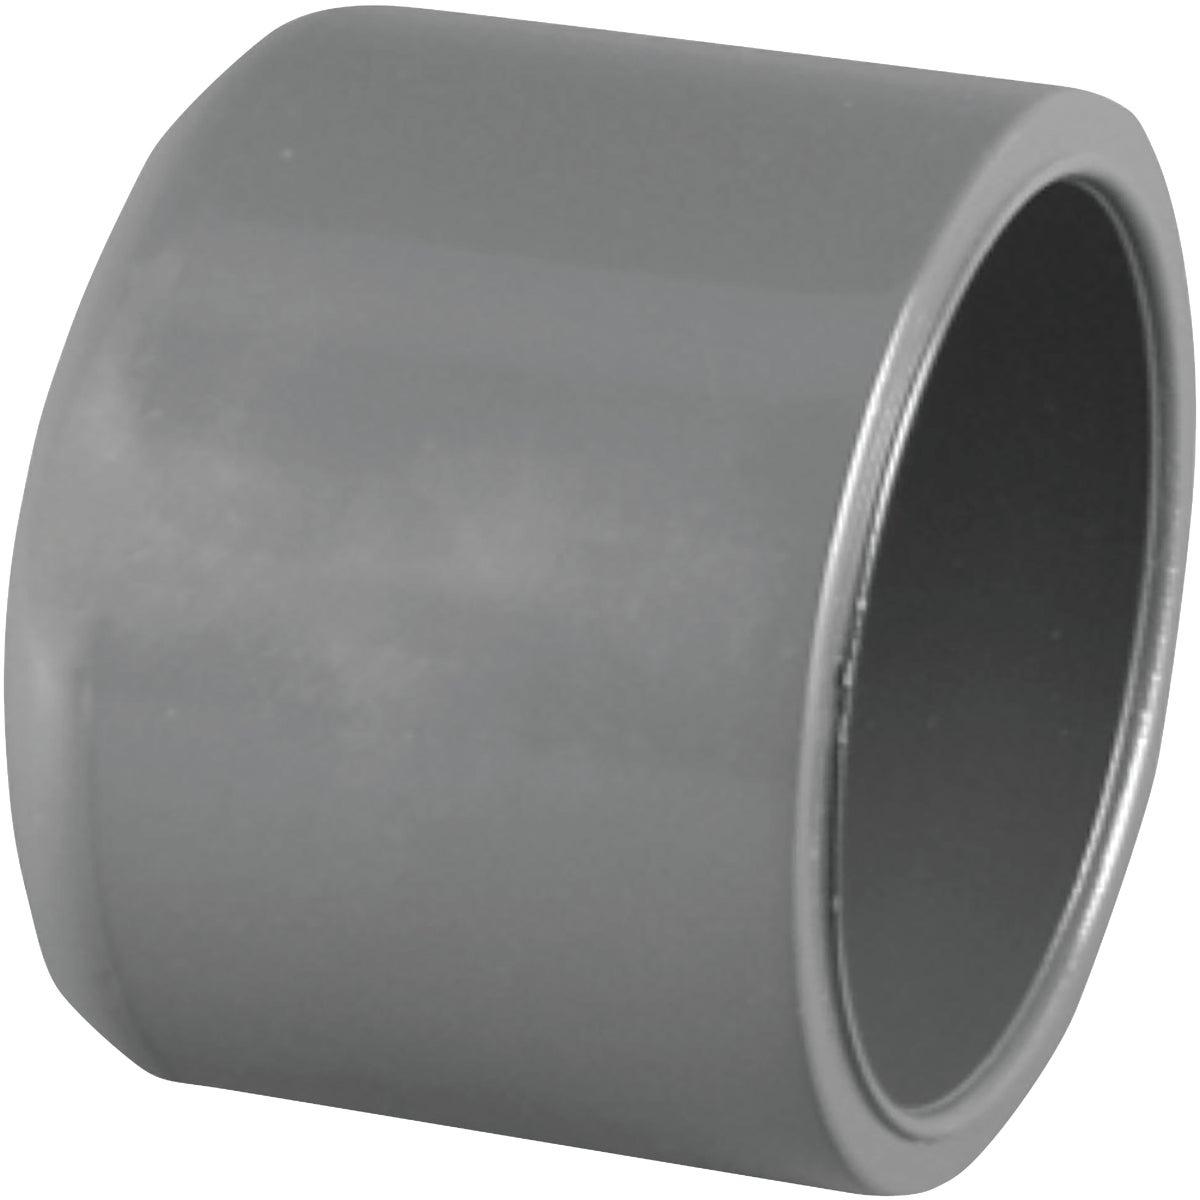 "1-1/2"" SCH80 PVC CAP - 301518 by Genova Inc"